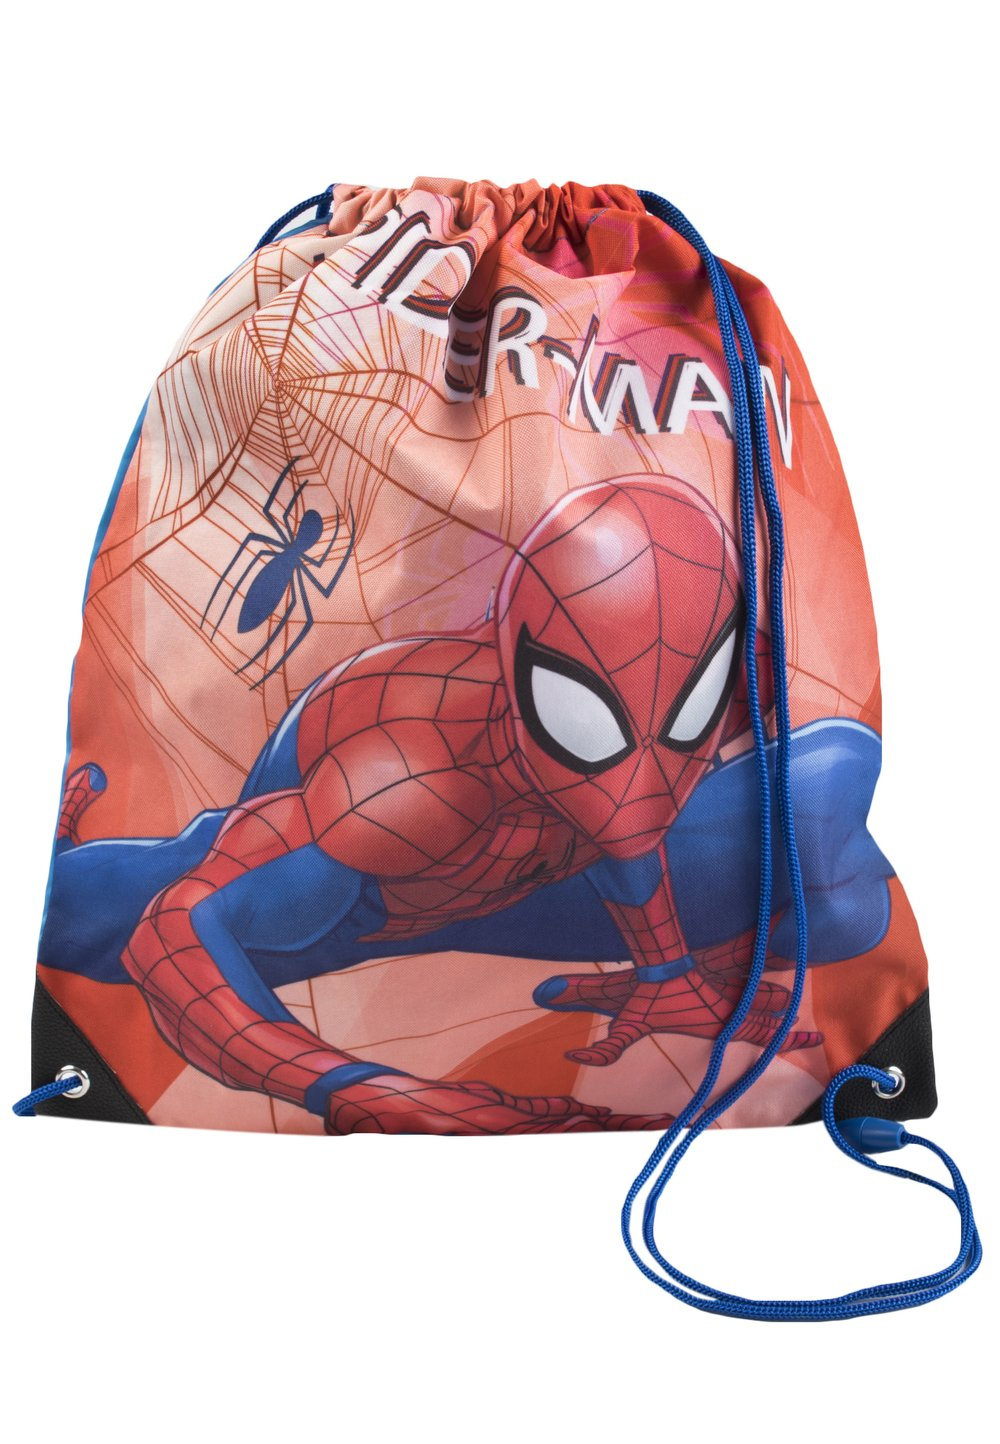 Sac, Ultimate Spider-Man, rosu, 38 x 32 cm imagine